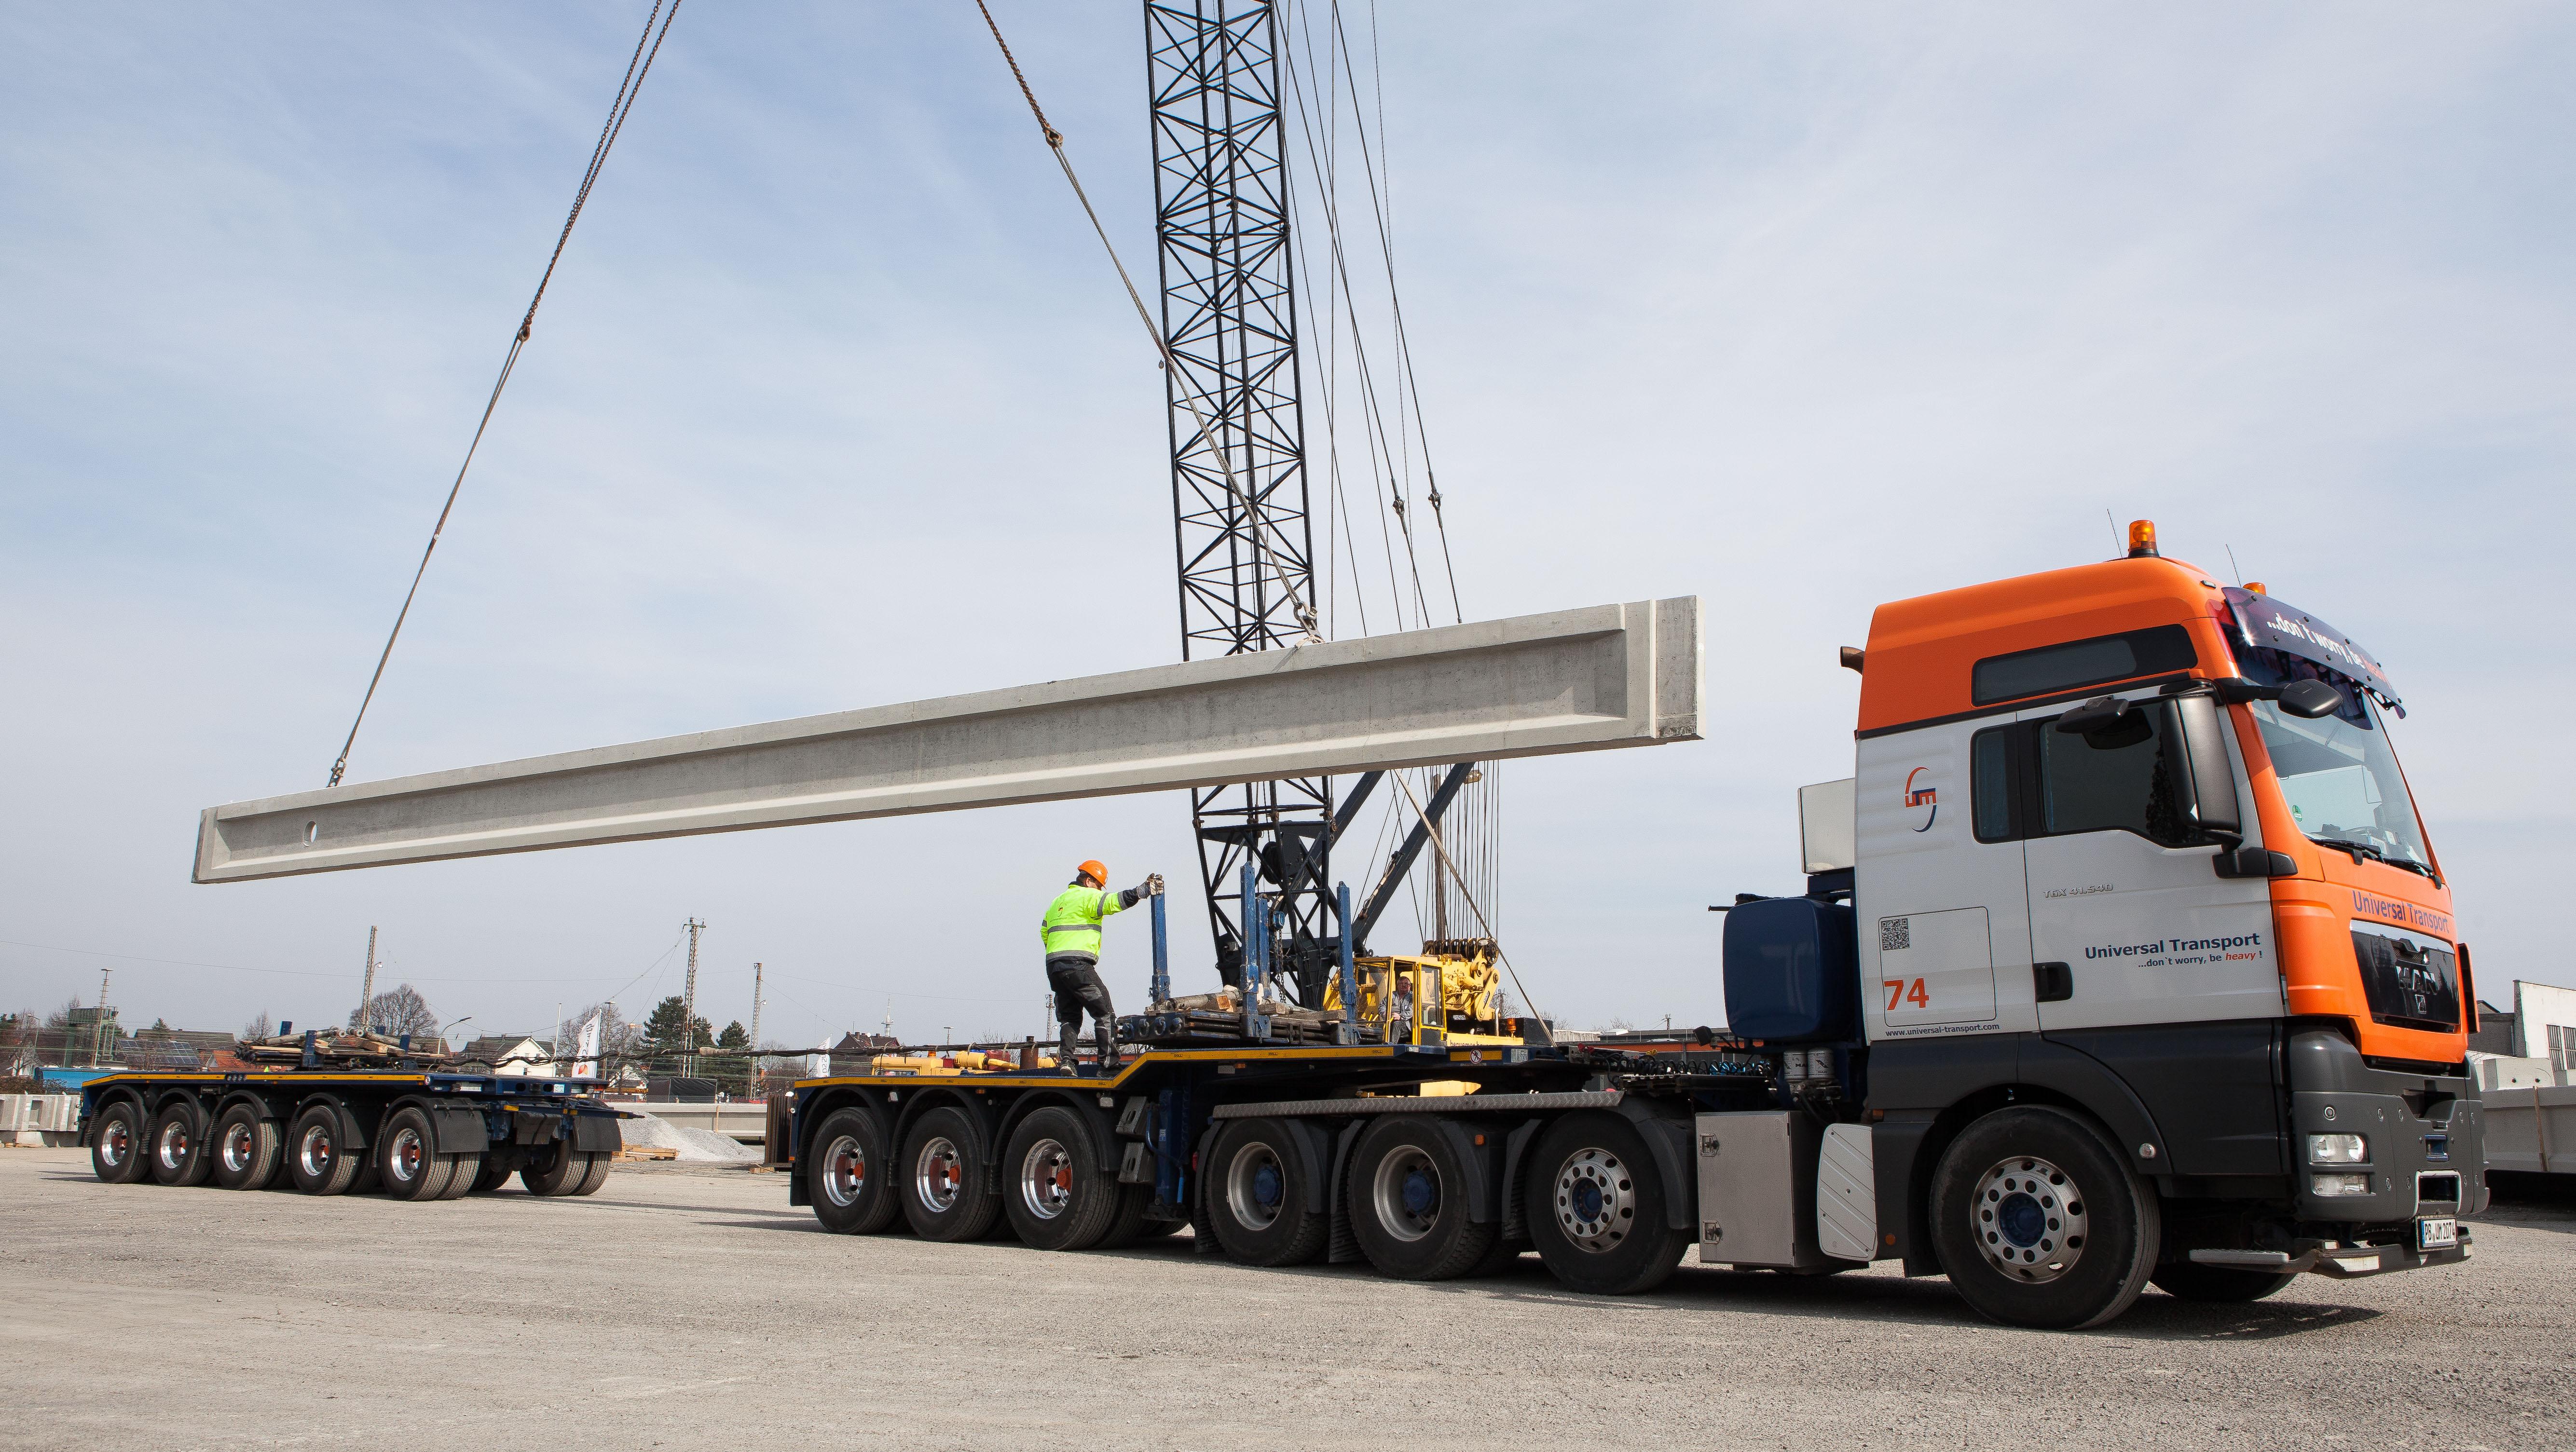 Universal Transport Bauwirtschaft